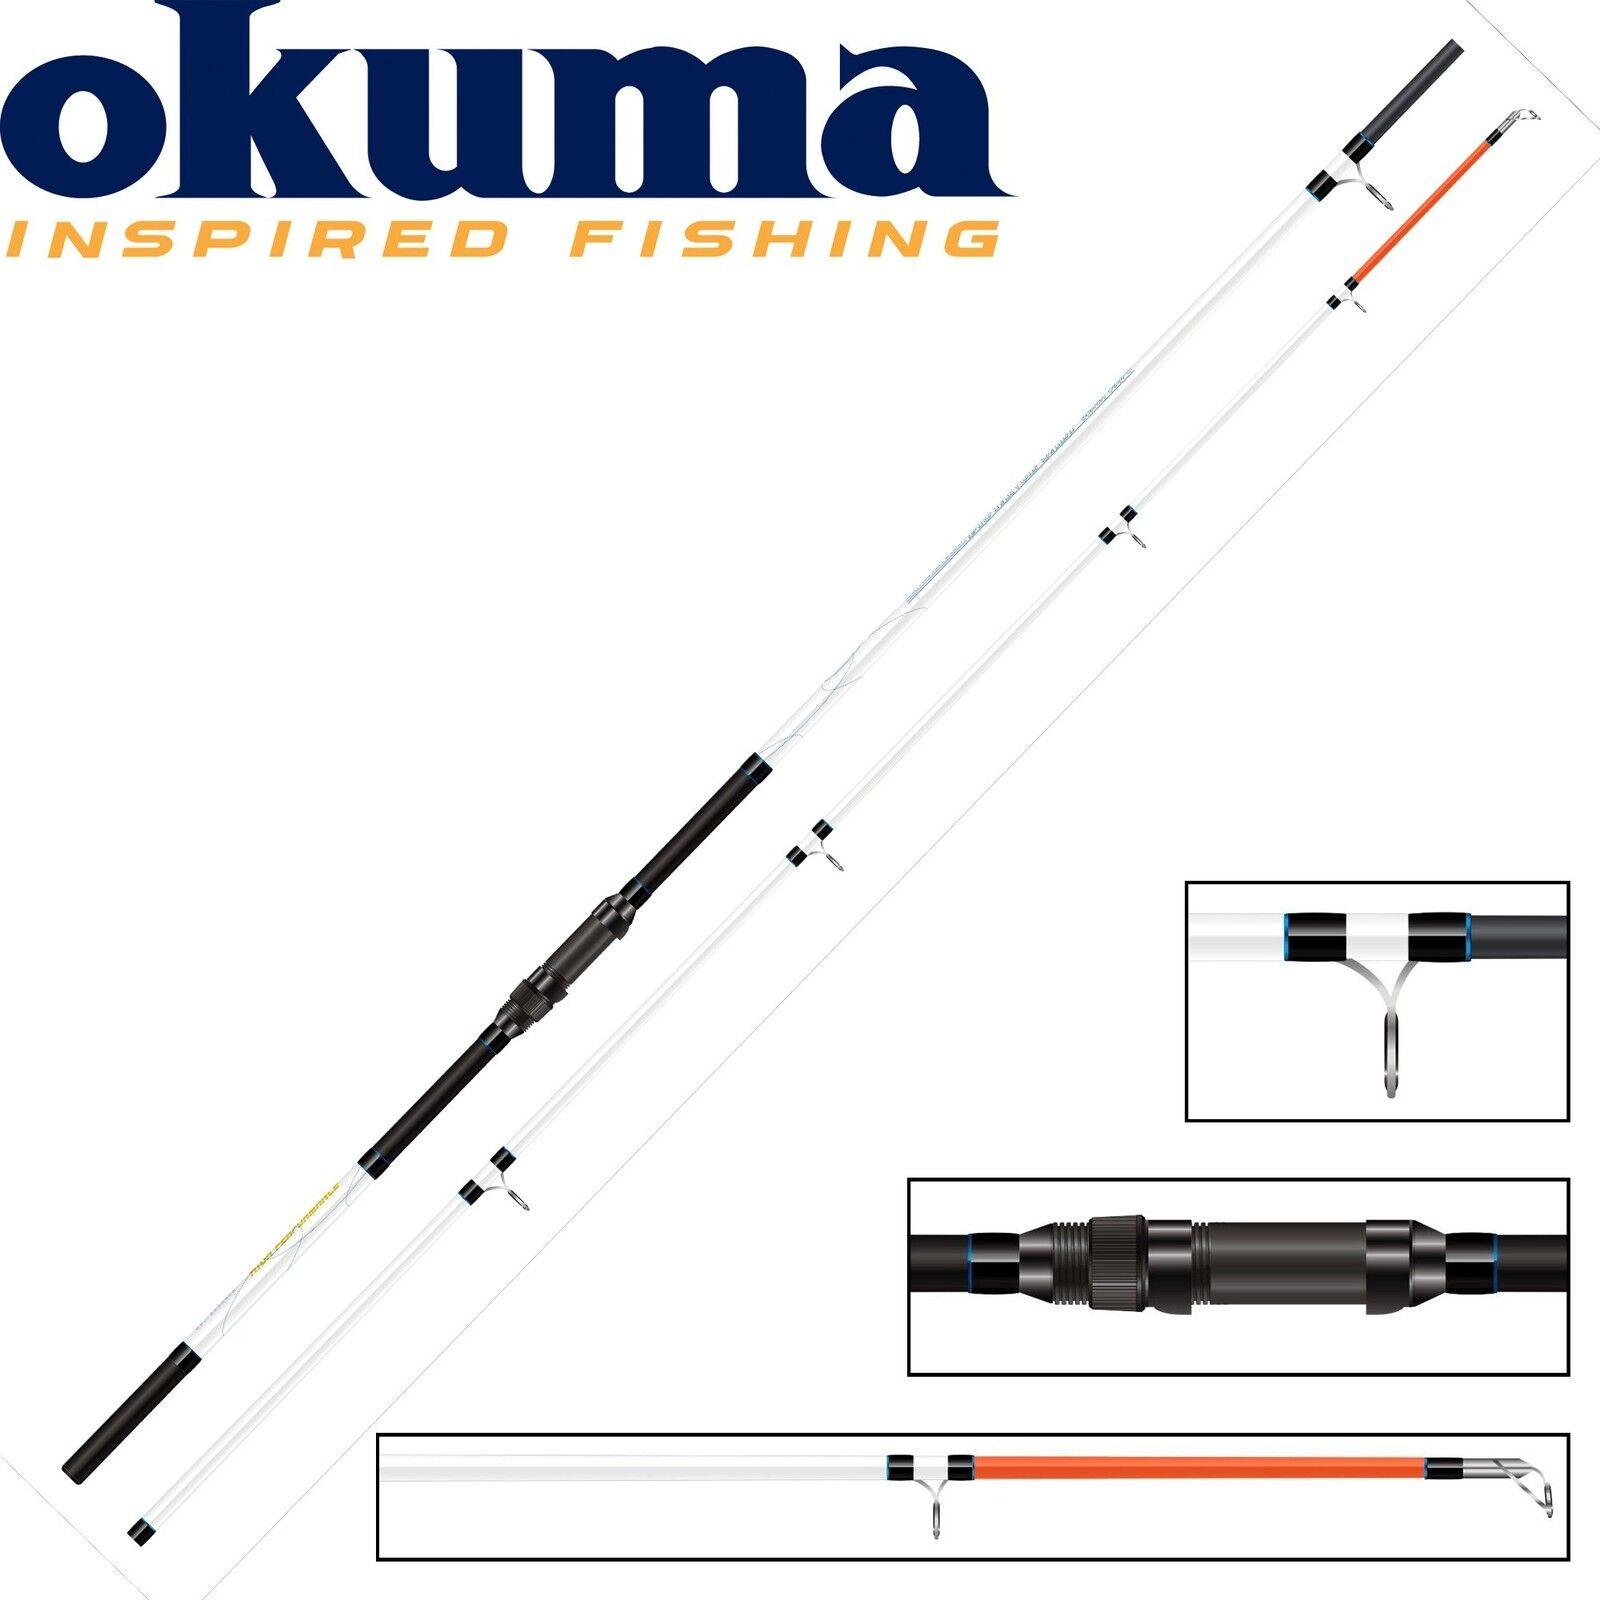 Okuma Okuma Okuma Distance Salt Beach 12ft 360cm 100-220g - Brandungsrute, Meeresrute e05fa0